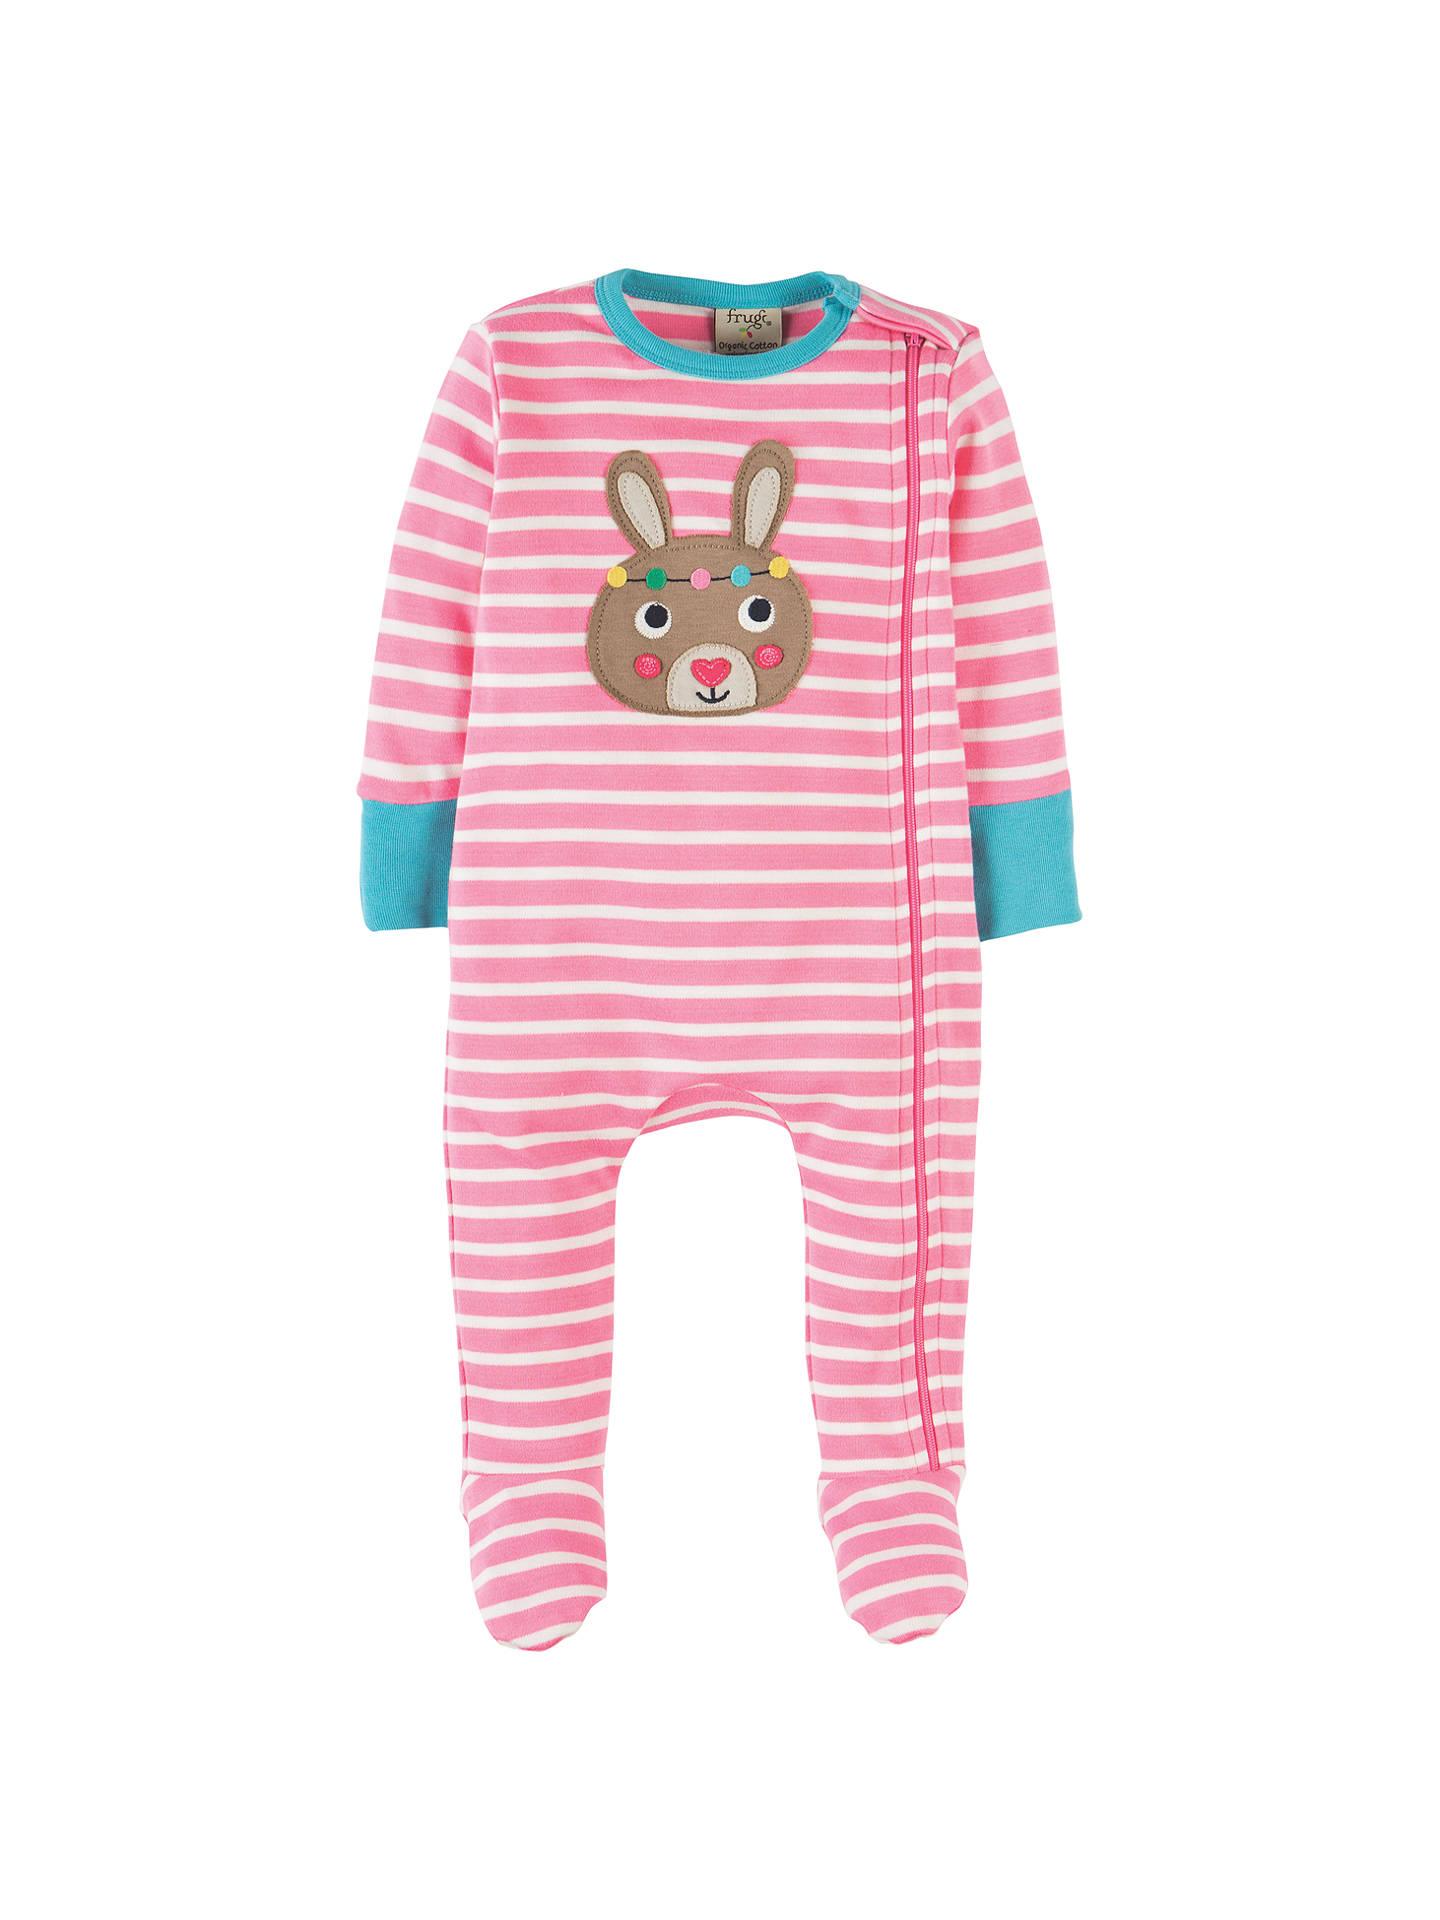 c6fd4db7f Frugi Organic Baby Bunny Zippy Babygrow Sleepsuit